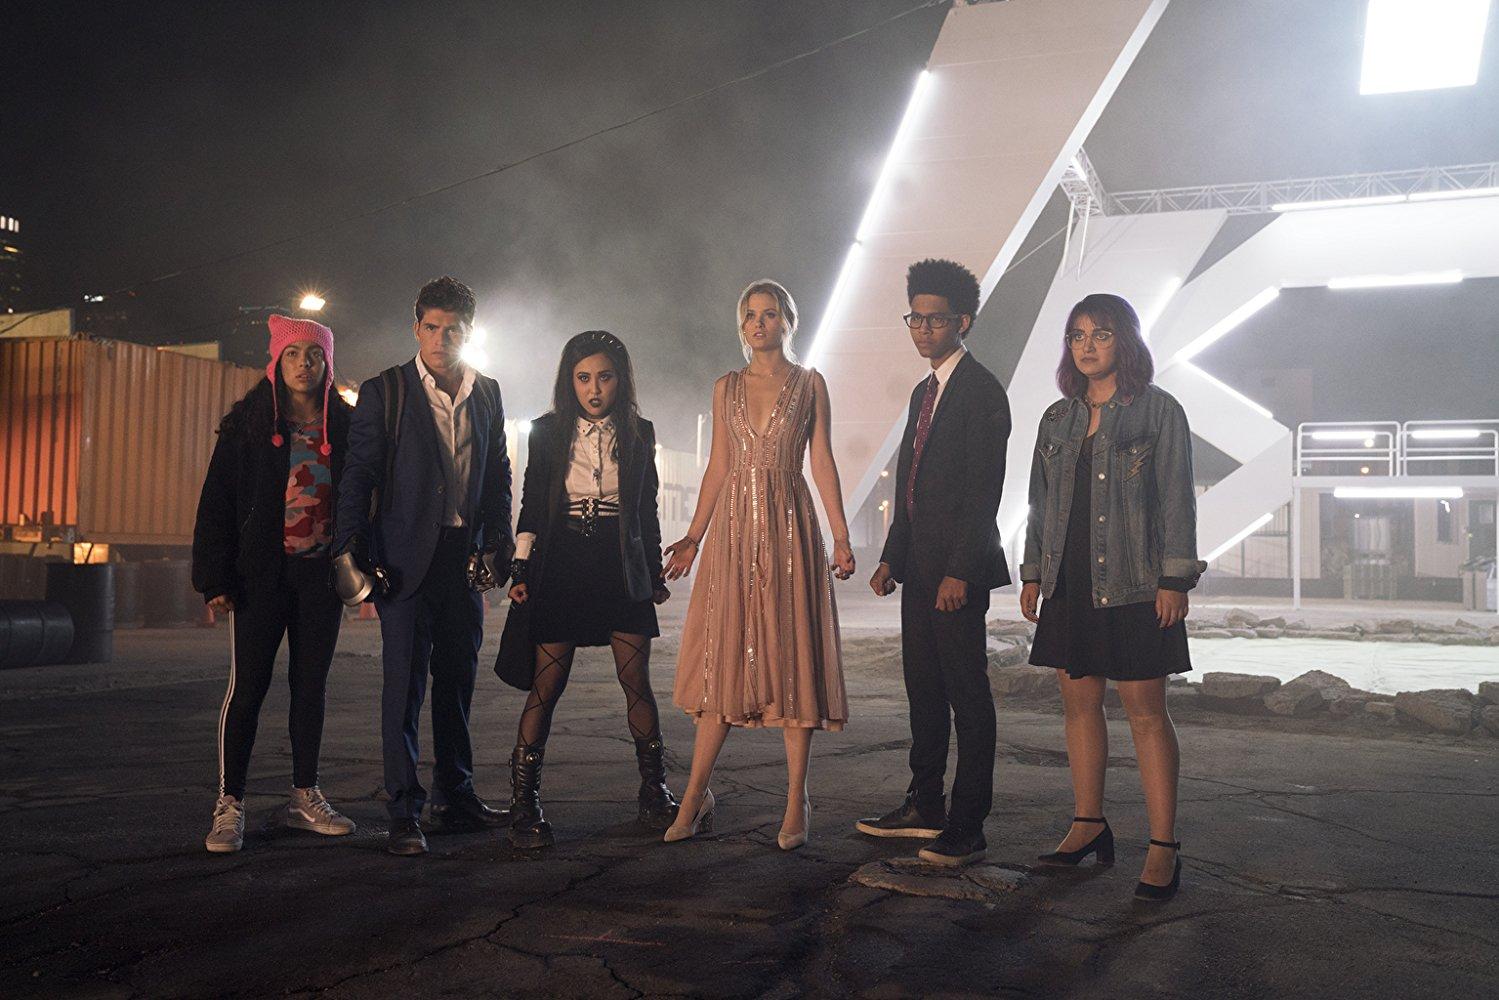 Runaways Season 1 Review & Catch-Up